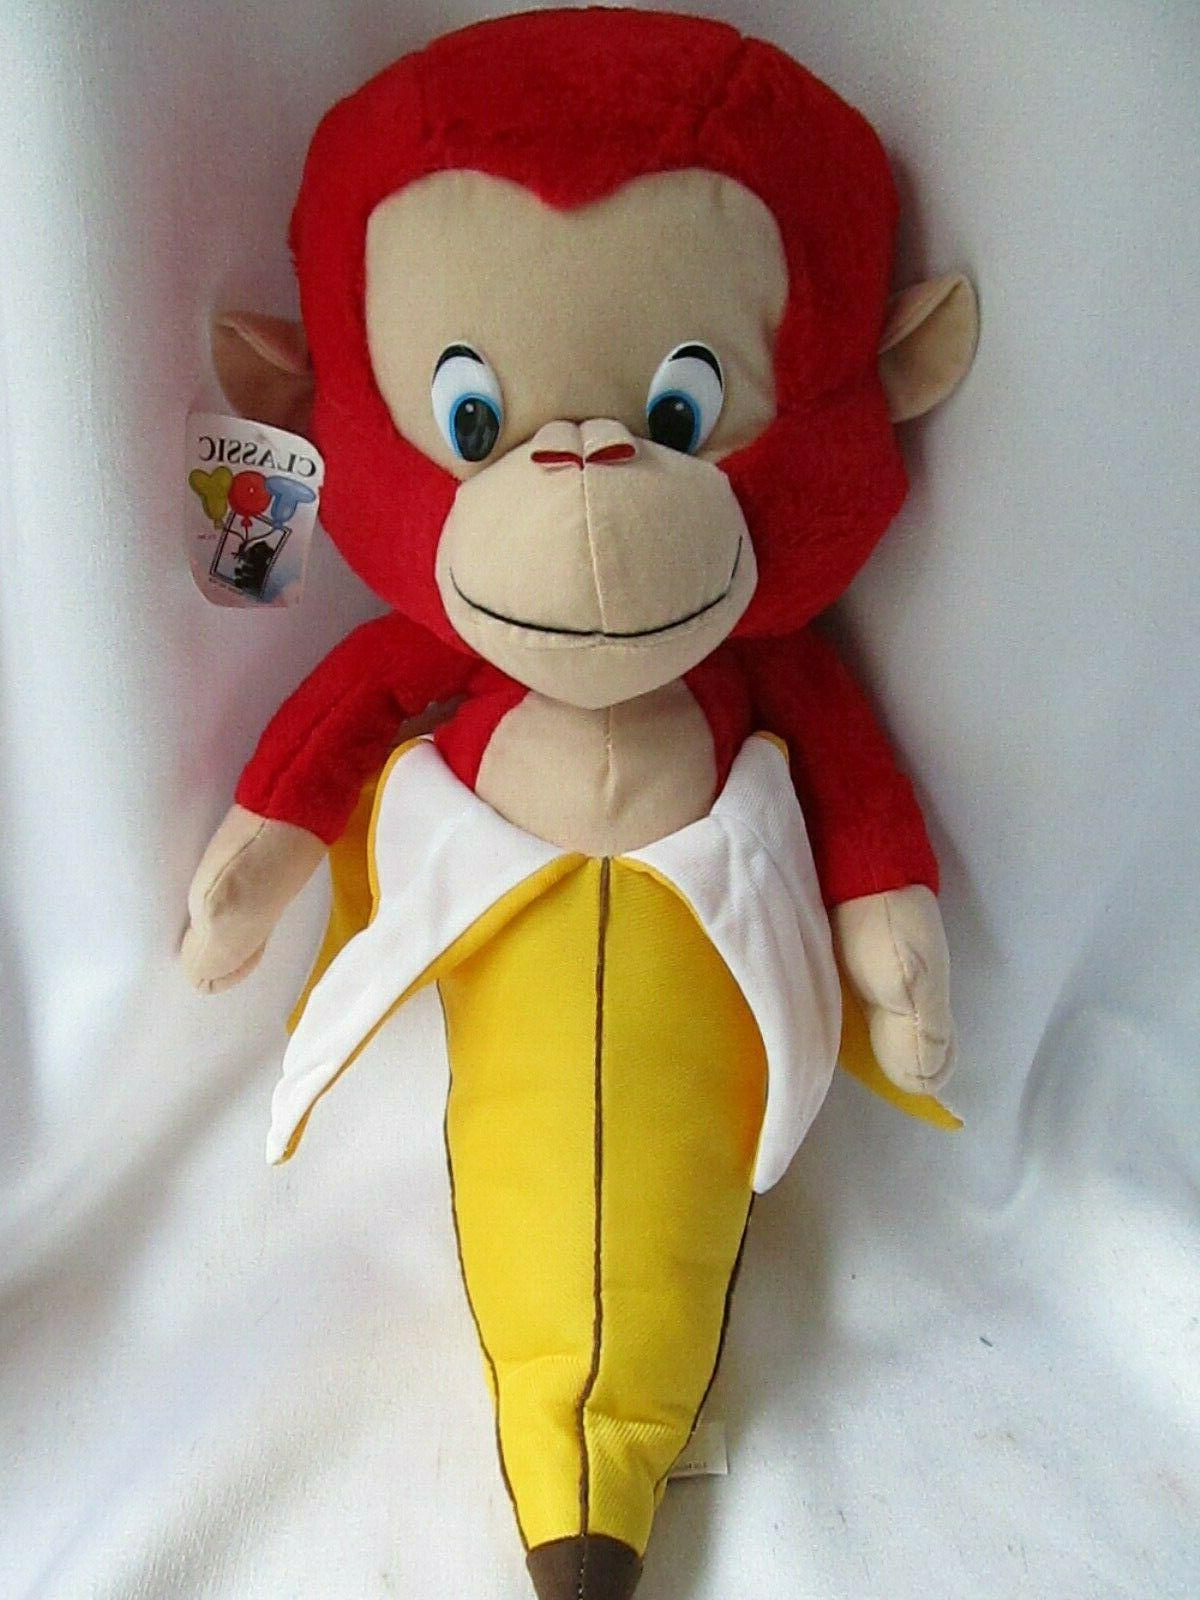 red monkey banana peel plush chimp 21